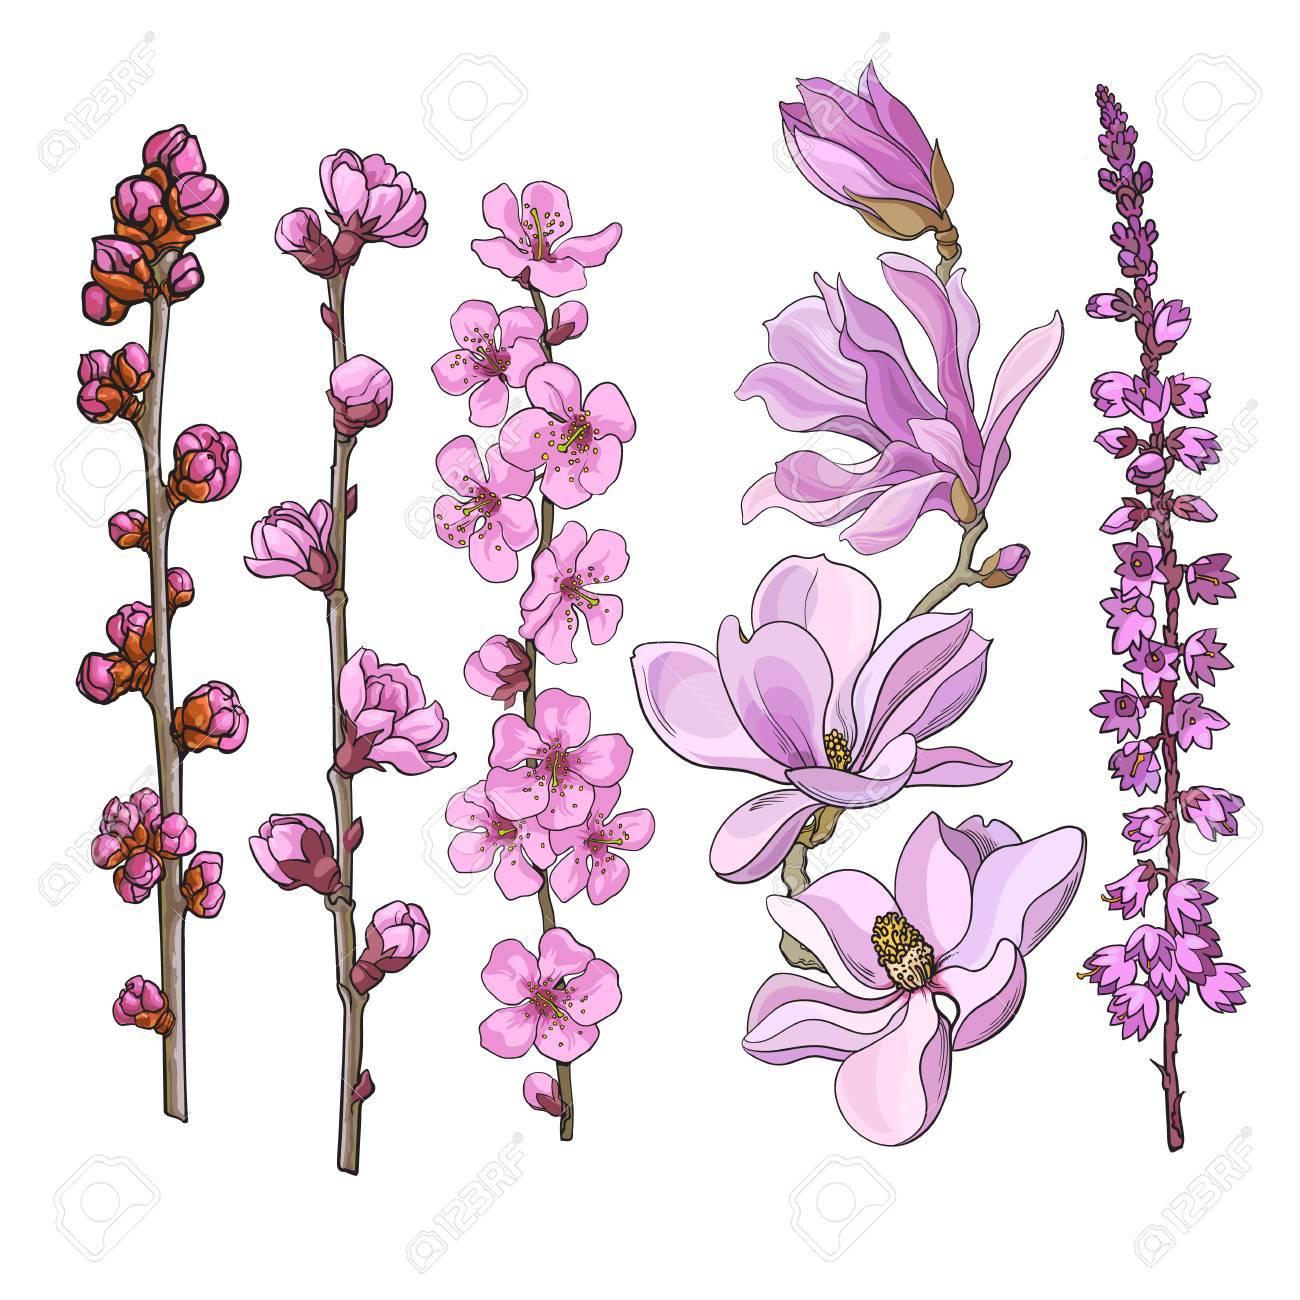 Set of hand drawn pink flowers magnolia apple and cherry blossom set of hand drawn pink flowers magnolia apple and cherry blossom heather mightylinksfo